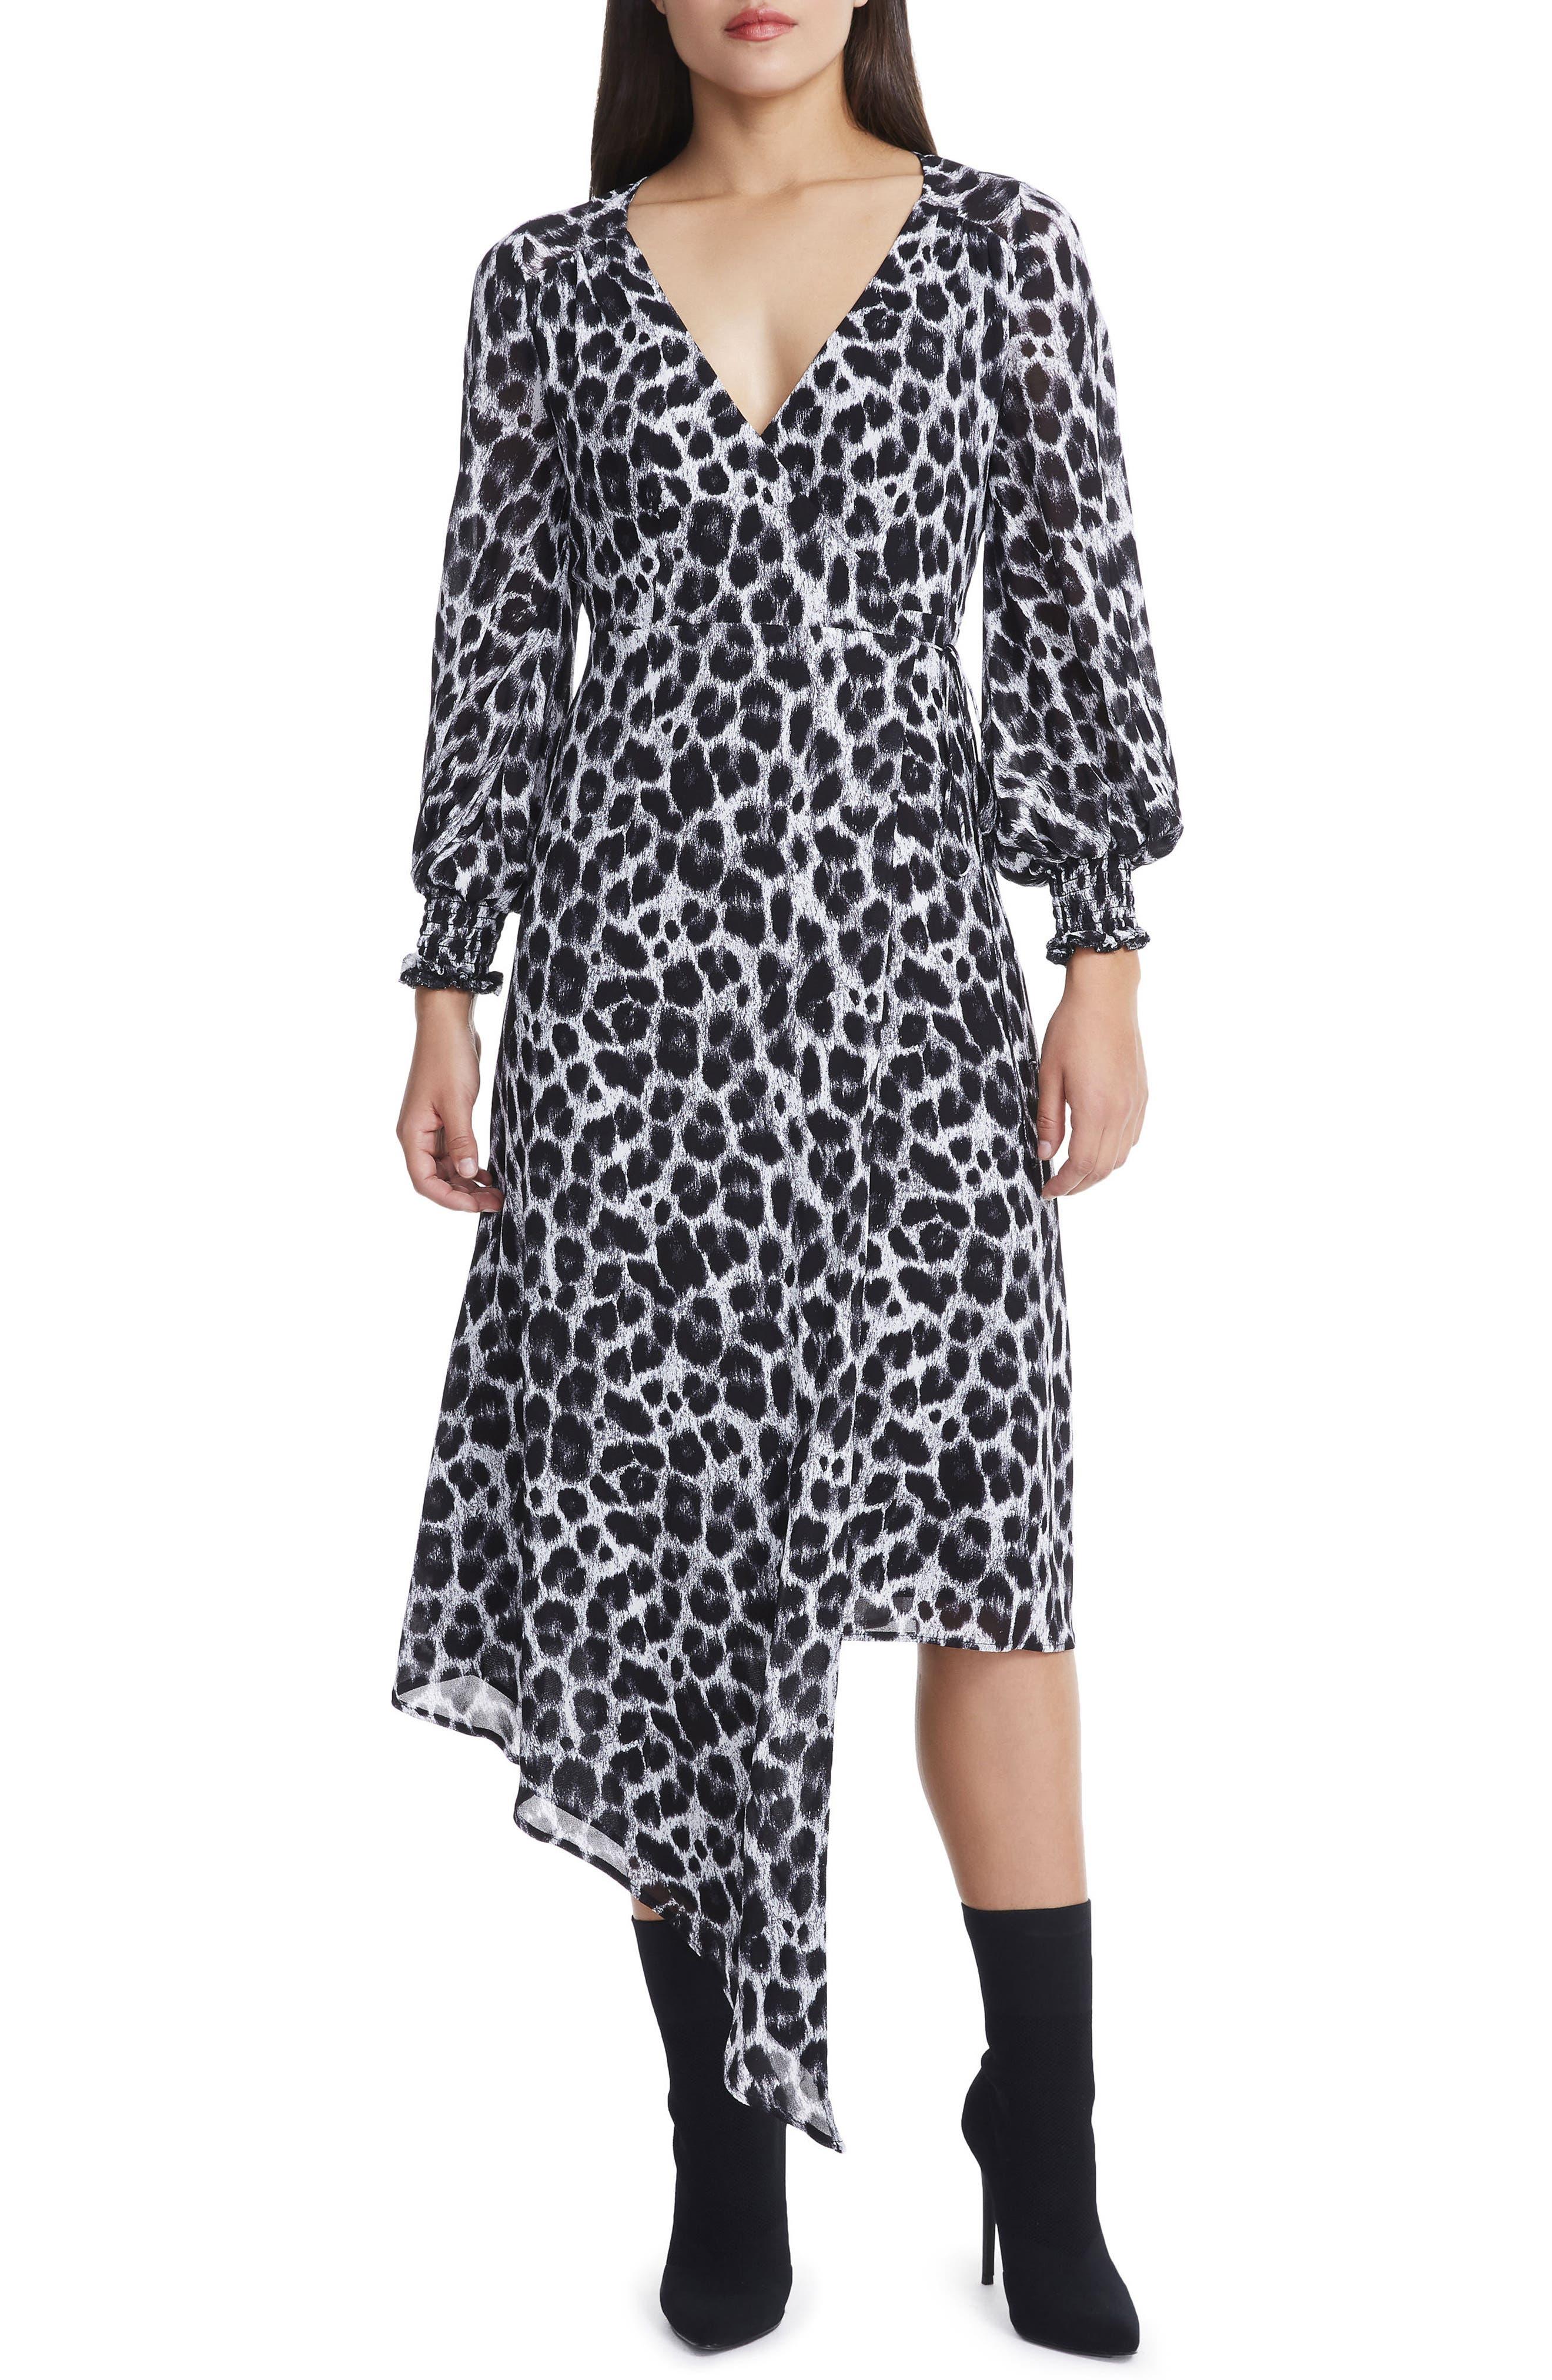 Amalfi Lantern Wrap Dress,                             Main thumbnail 1, color,                             Grey Leopard